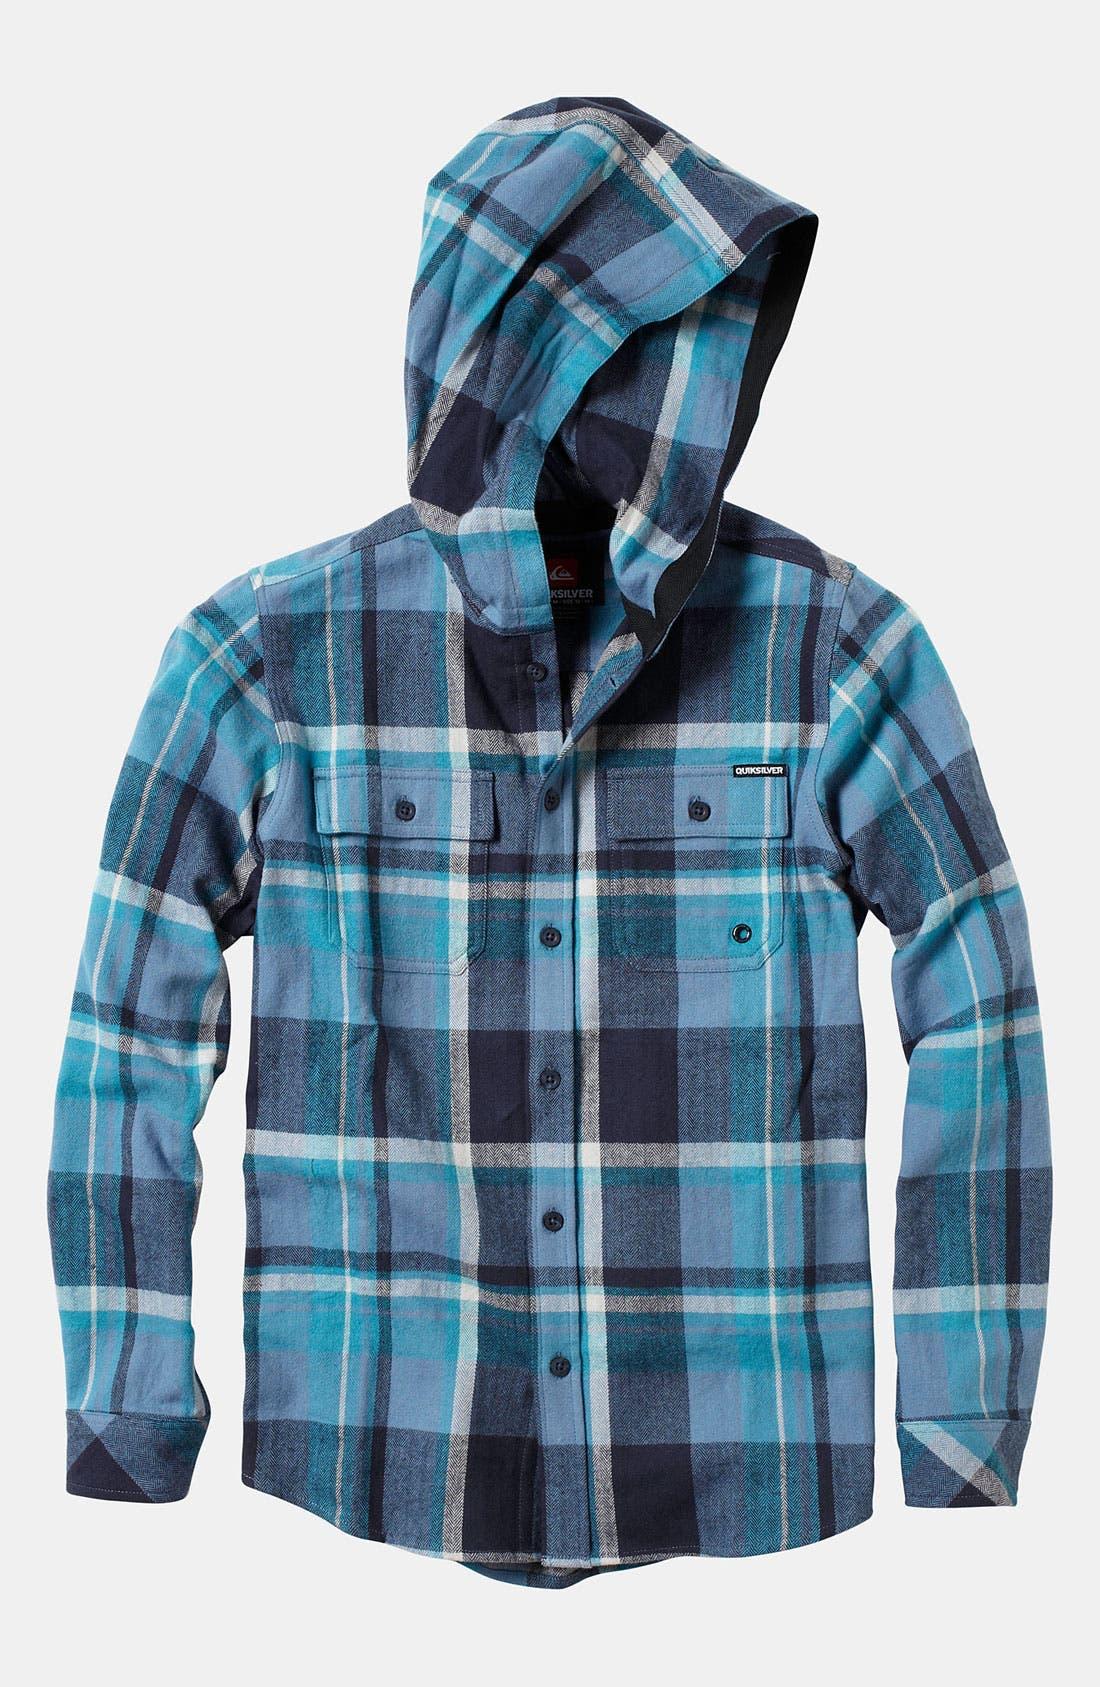 Alternate Image 1 Selected - Quiksilver 'Four Shore' Hooded Flannel Shirt (Little Boys)